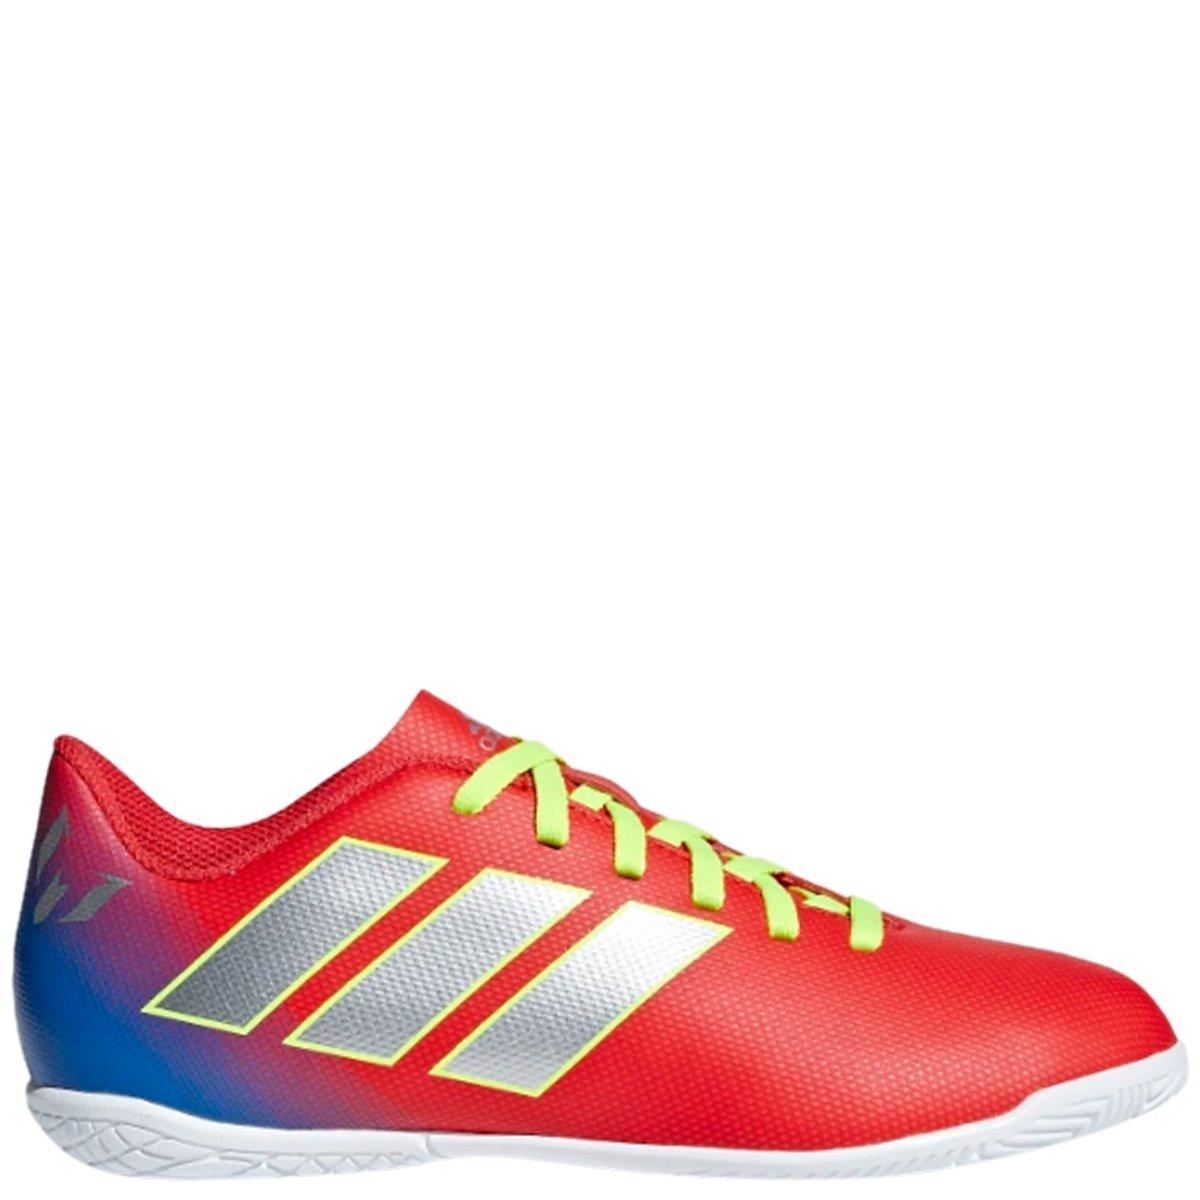 Chuteira Infantil Futsal Adidas Nemeziz Messi 18.4 JR - Vermelho Azul  7393e61862b38